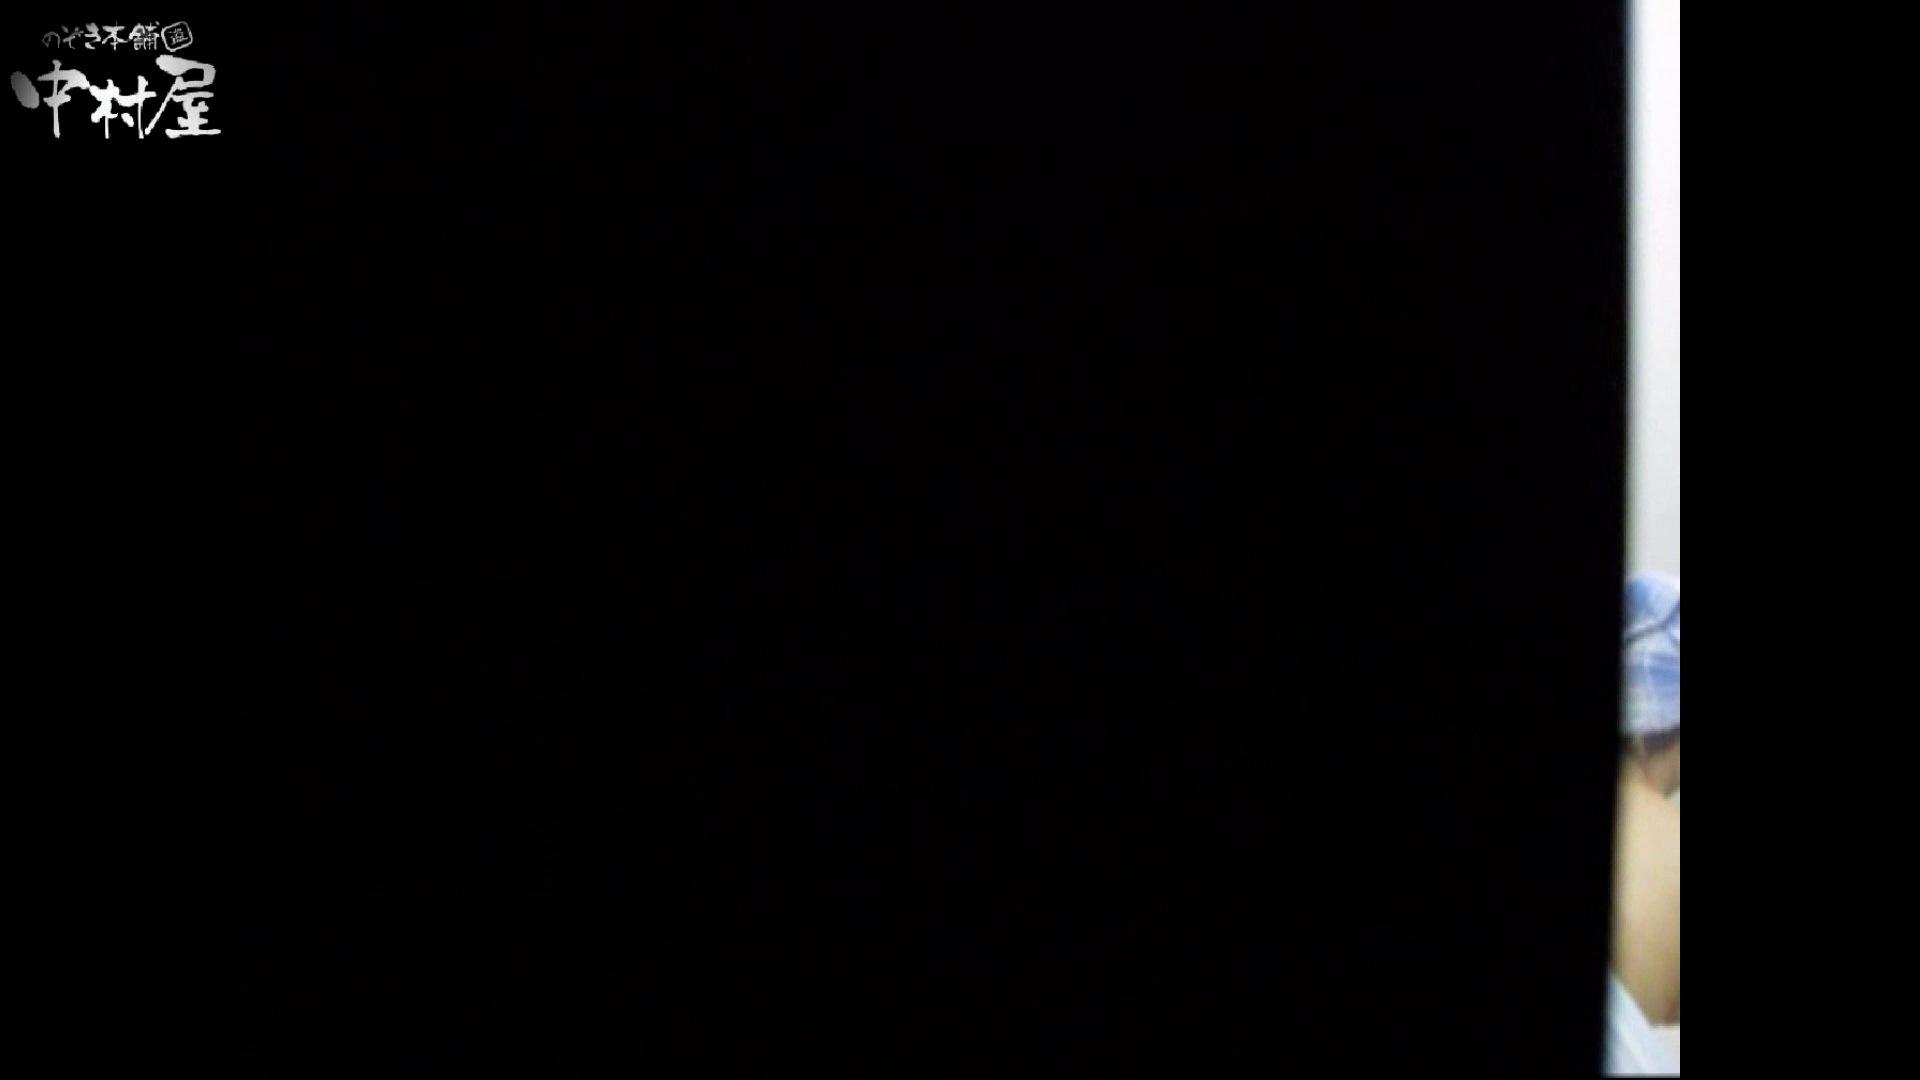 民家風呂専門盗撮師の超危険映像 vol.002 盗撮大放出 おめこ無修正動画無料 66連発 24